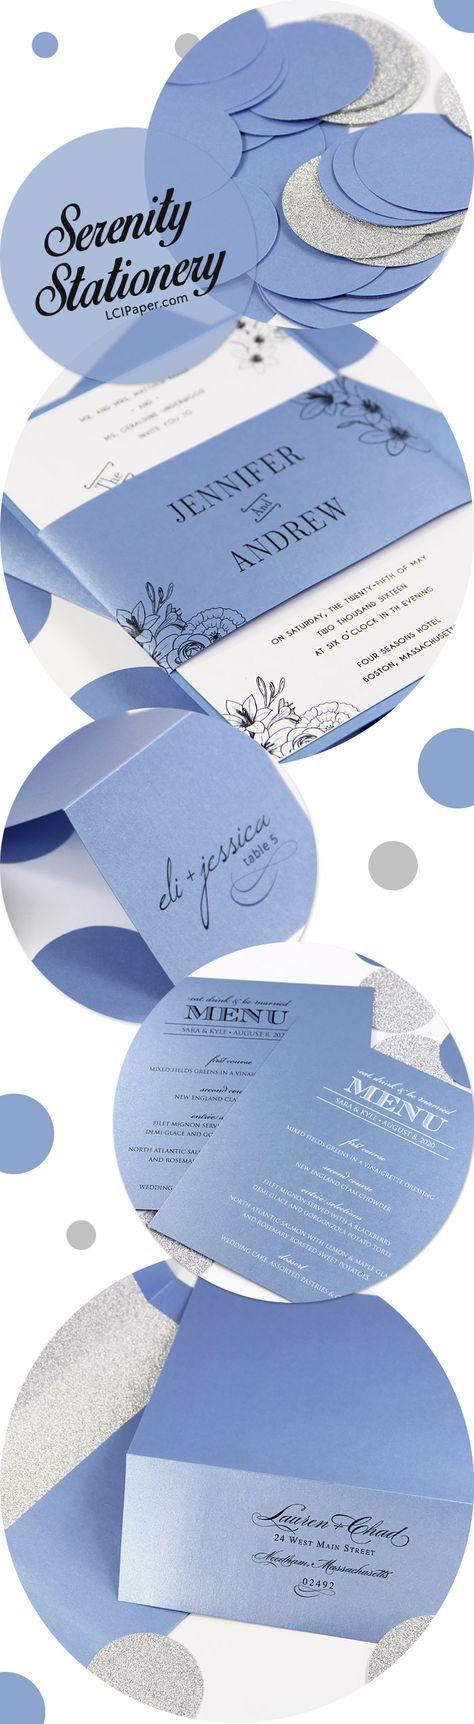 Serenity spring wedding stationery collage. Stardream Vista a ...